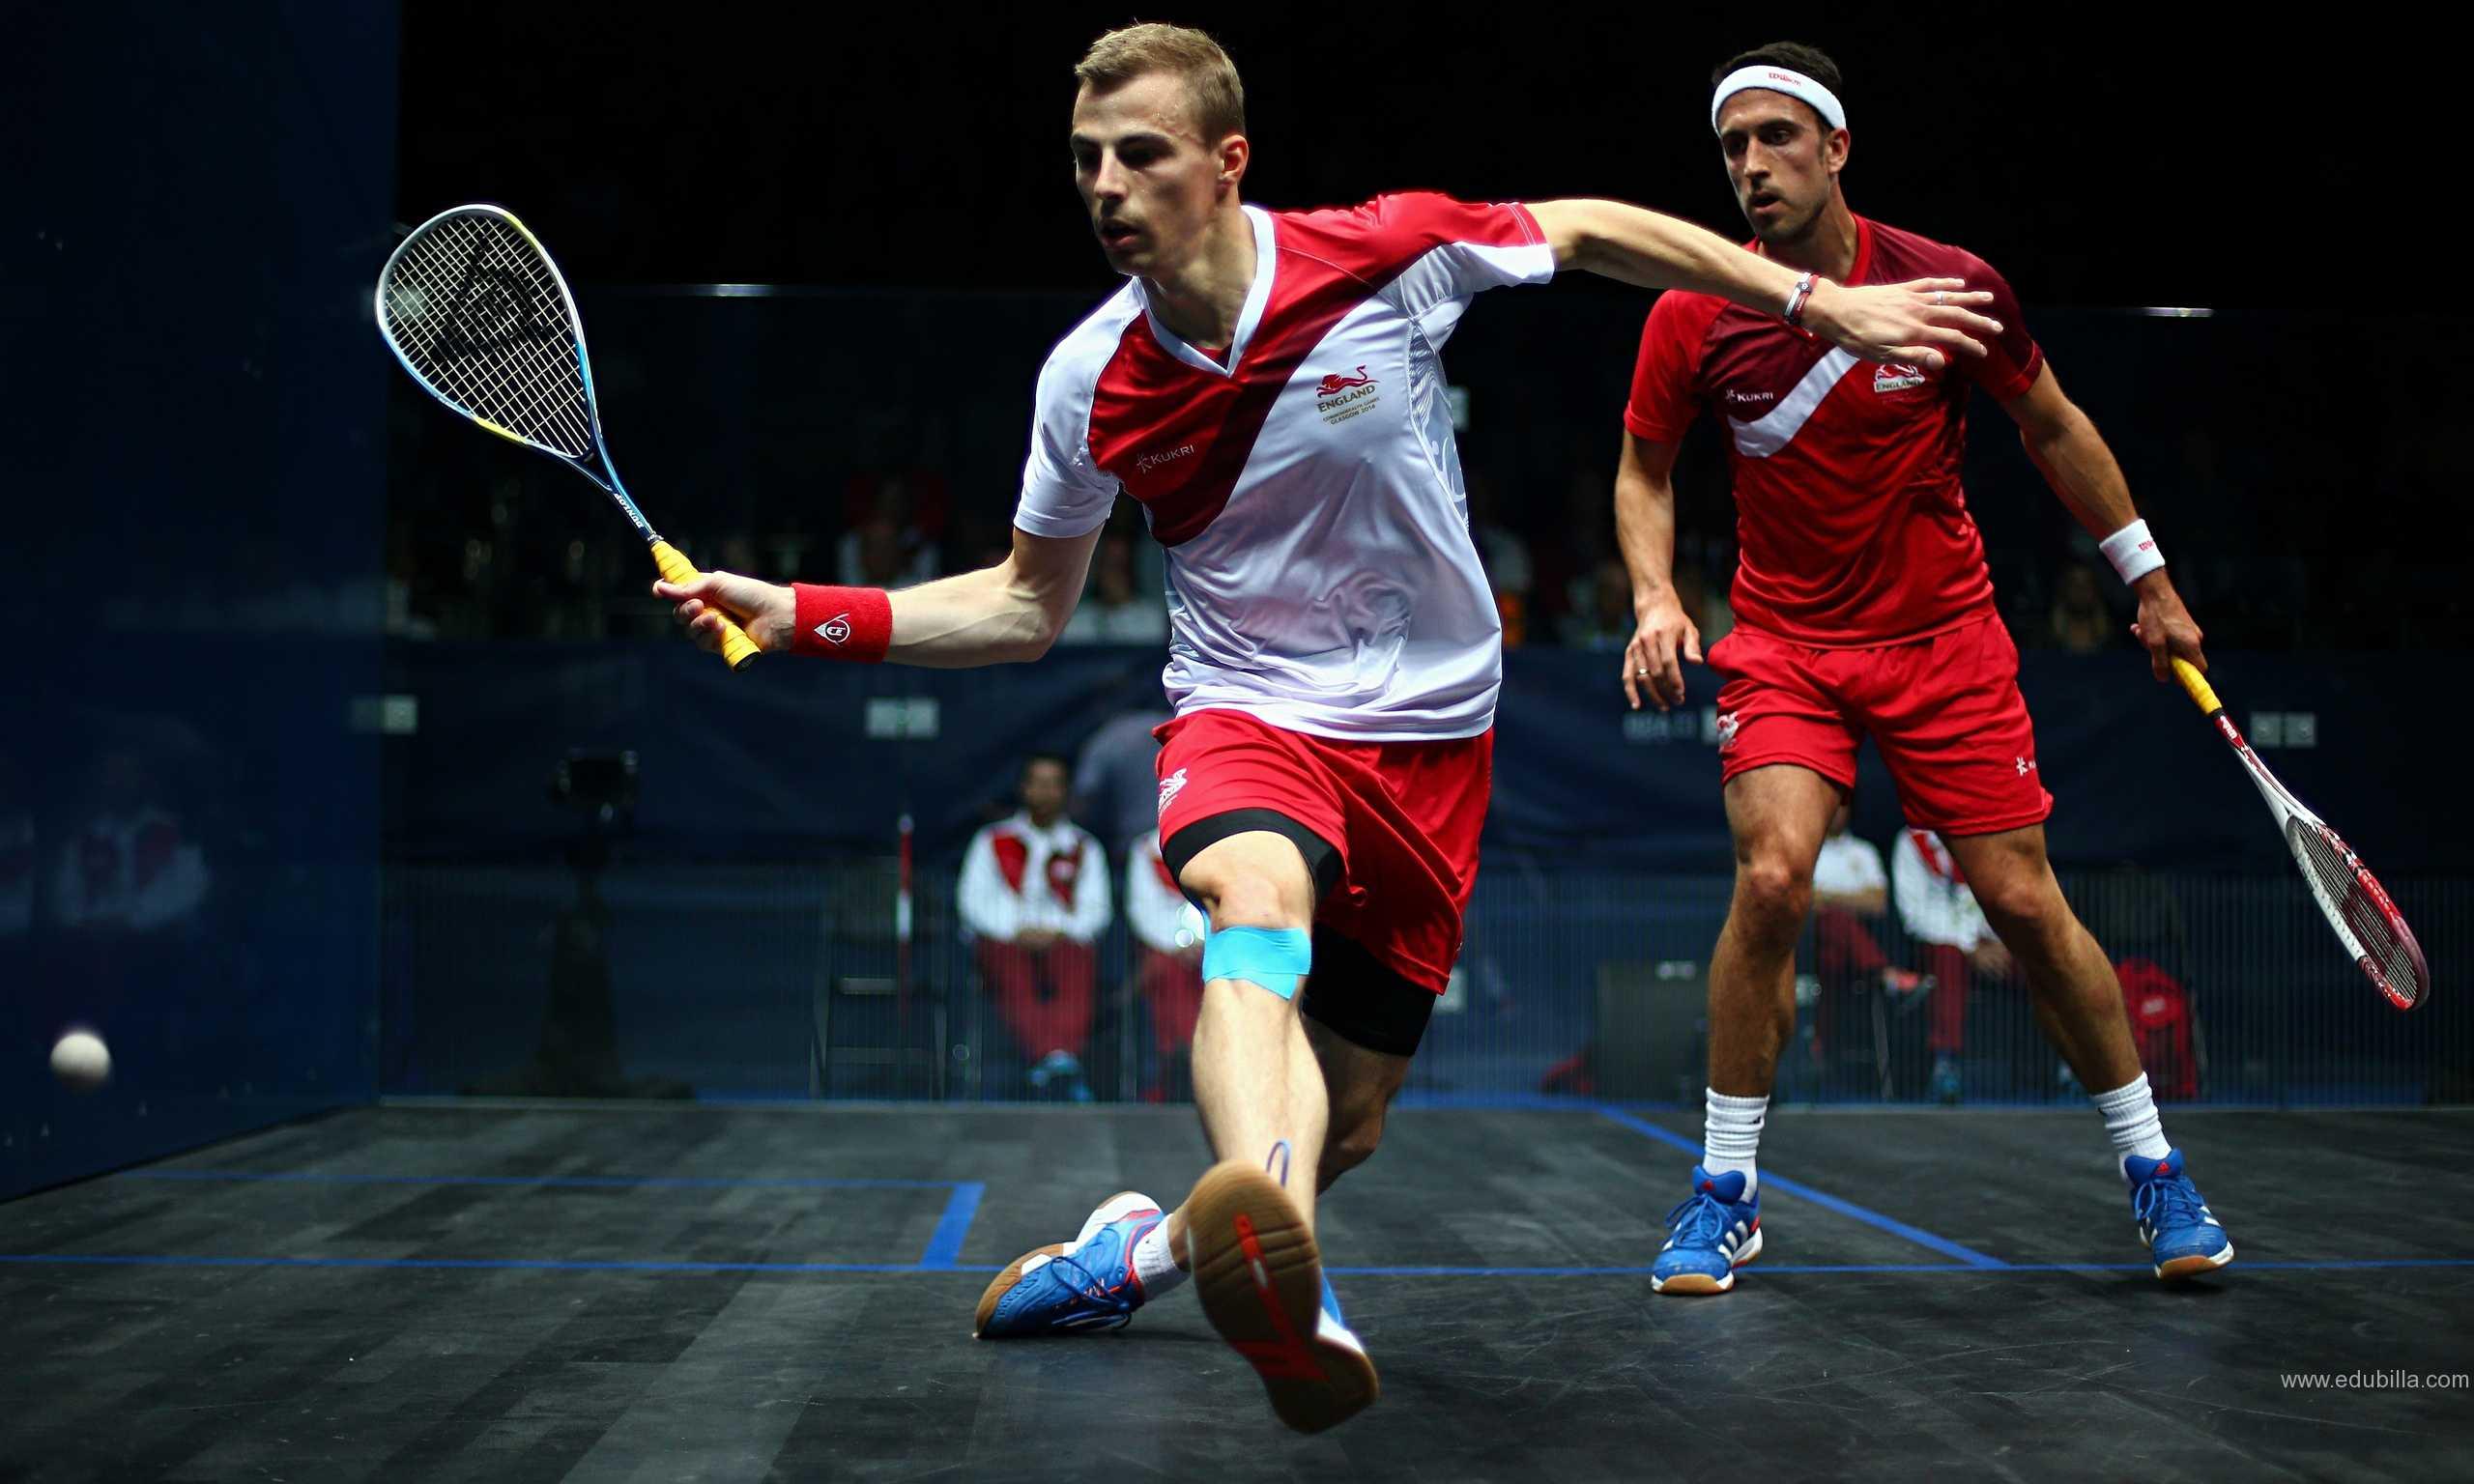 squashsport6.jpg